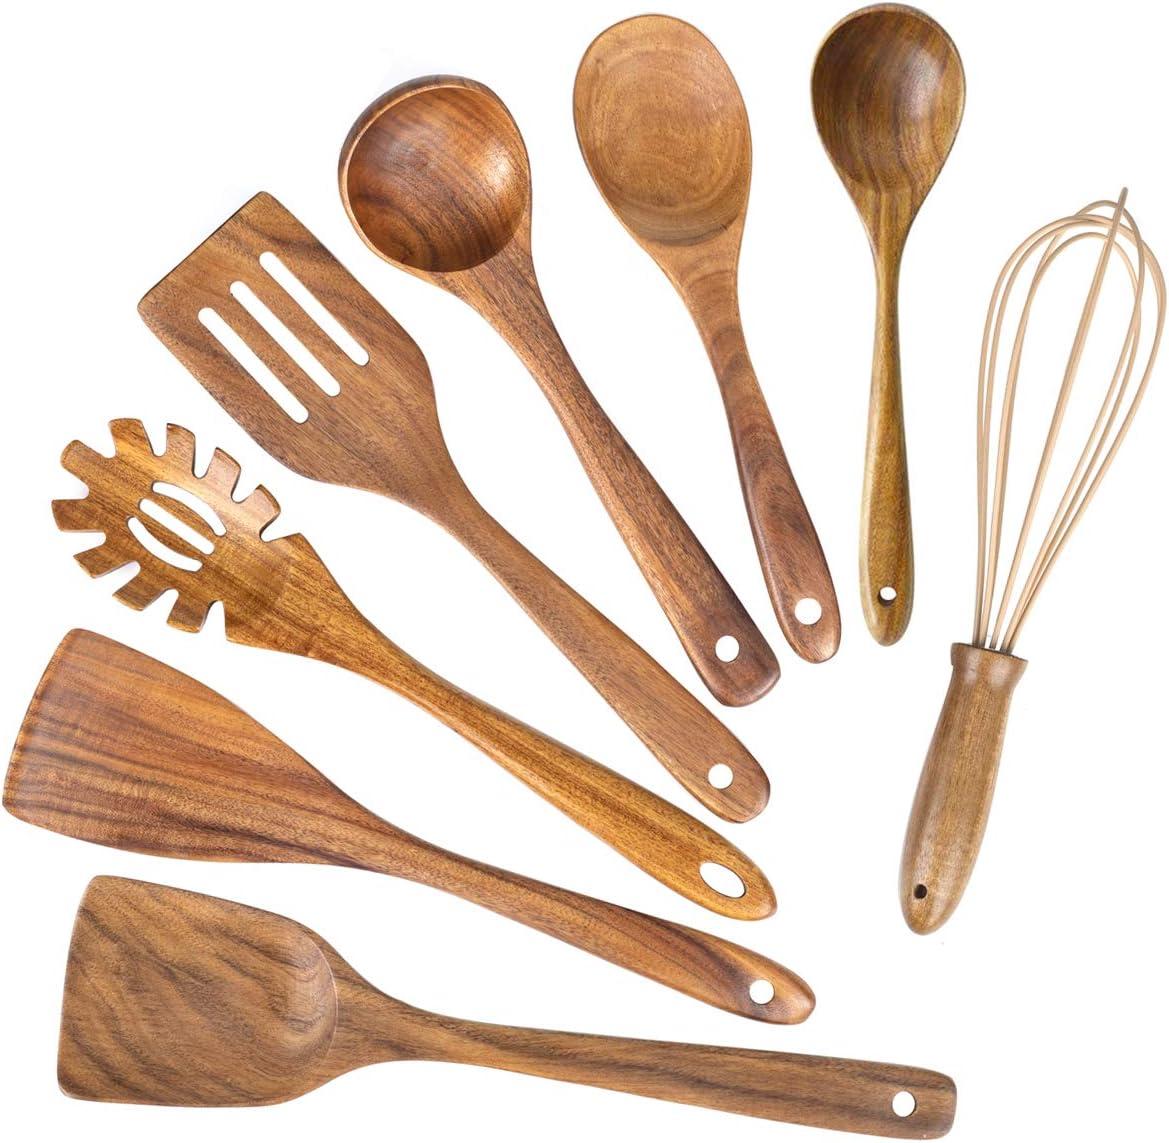 Wooden Kitchen Utensils 5 ☆ very popular for Cooking Natural Wood Teak Se Free shipping Utensil